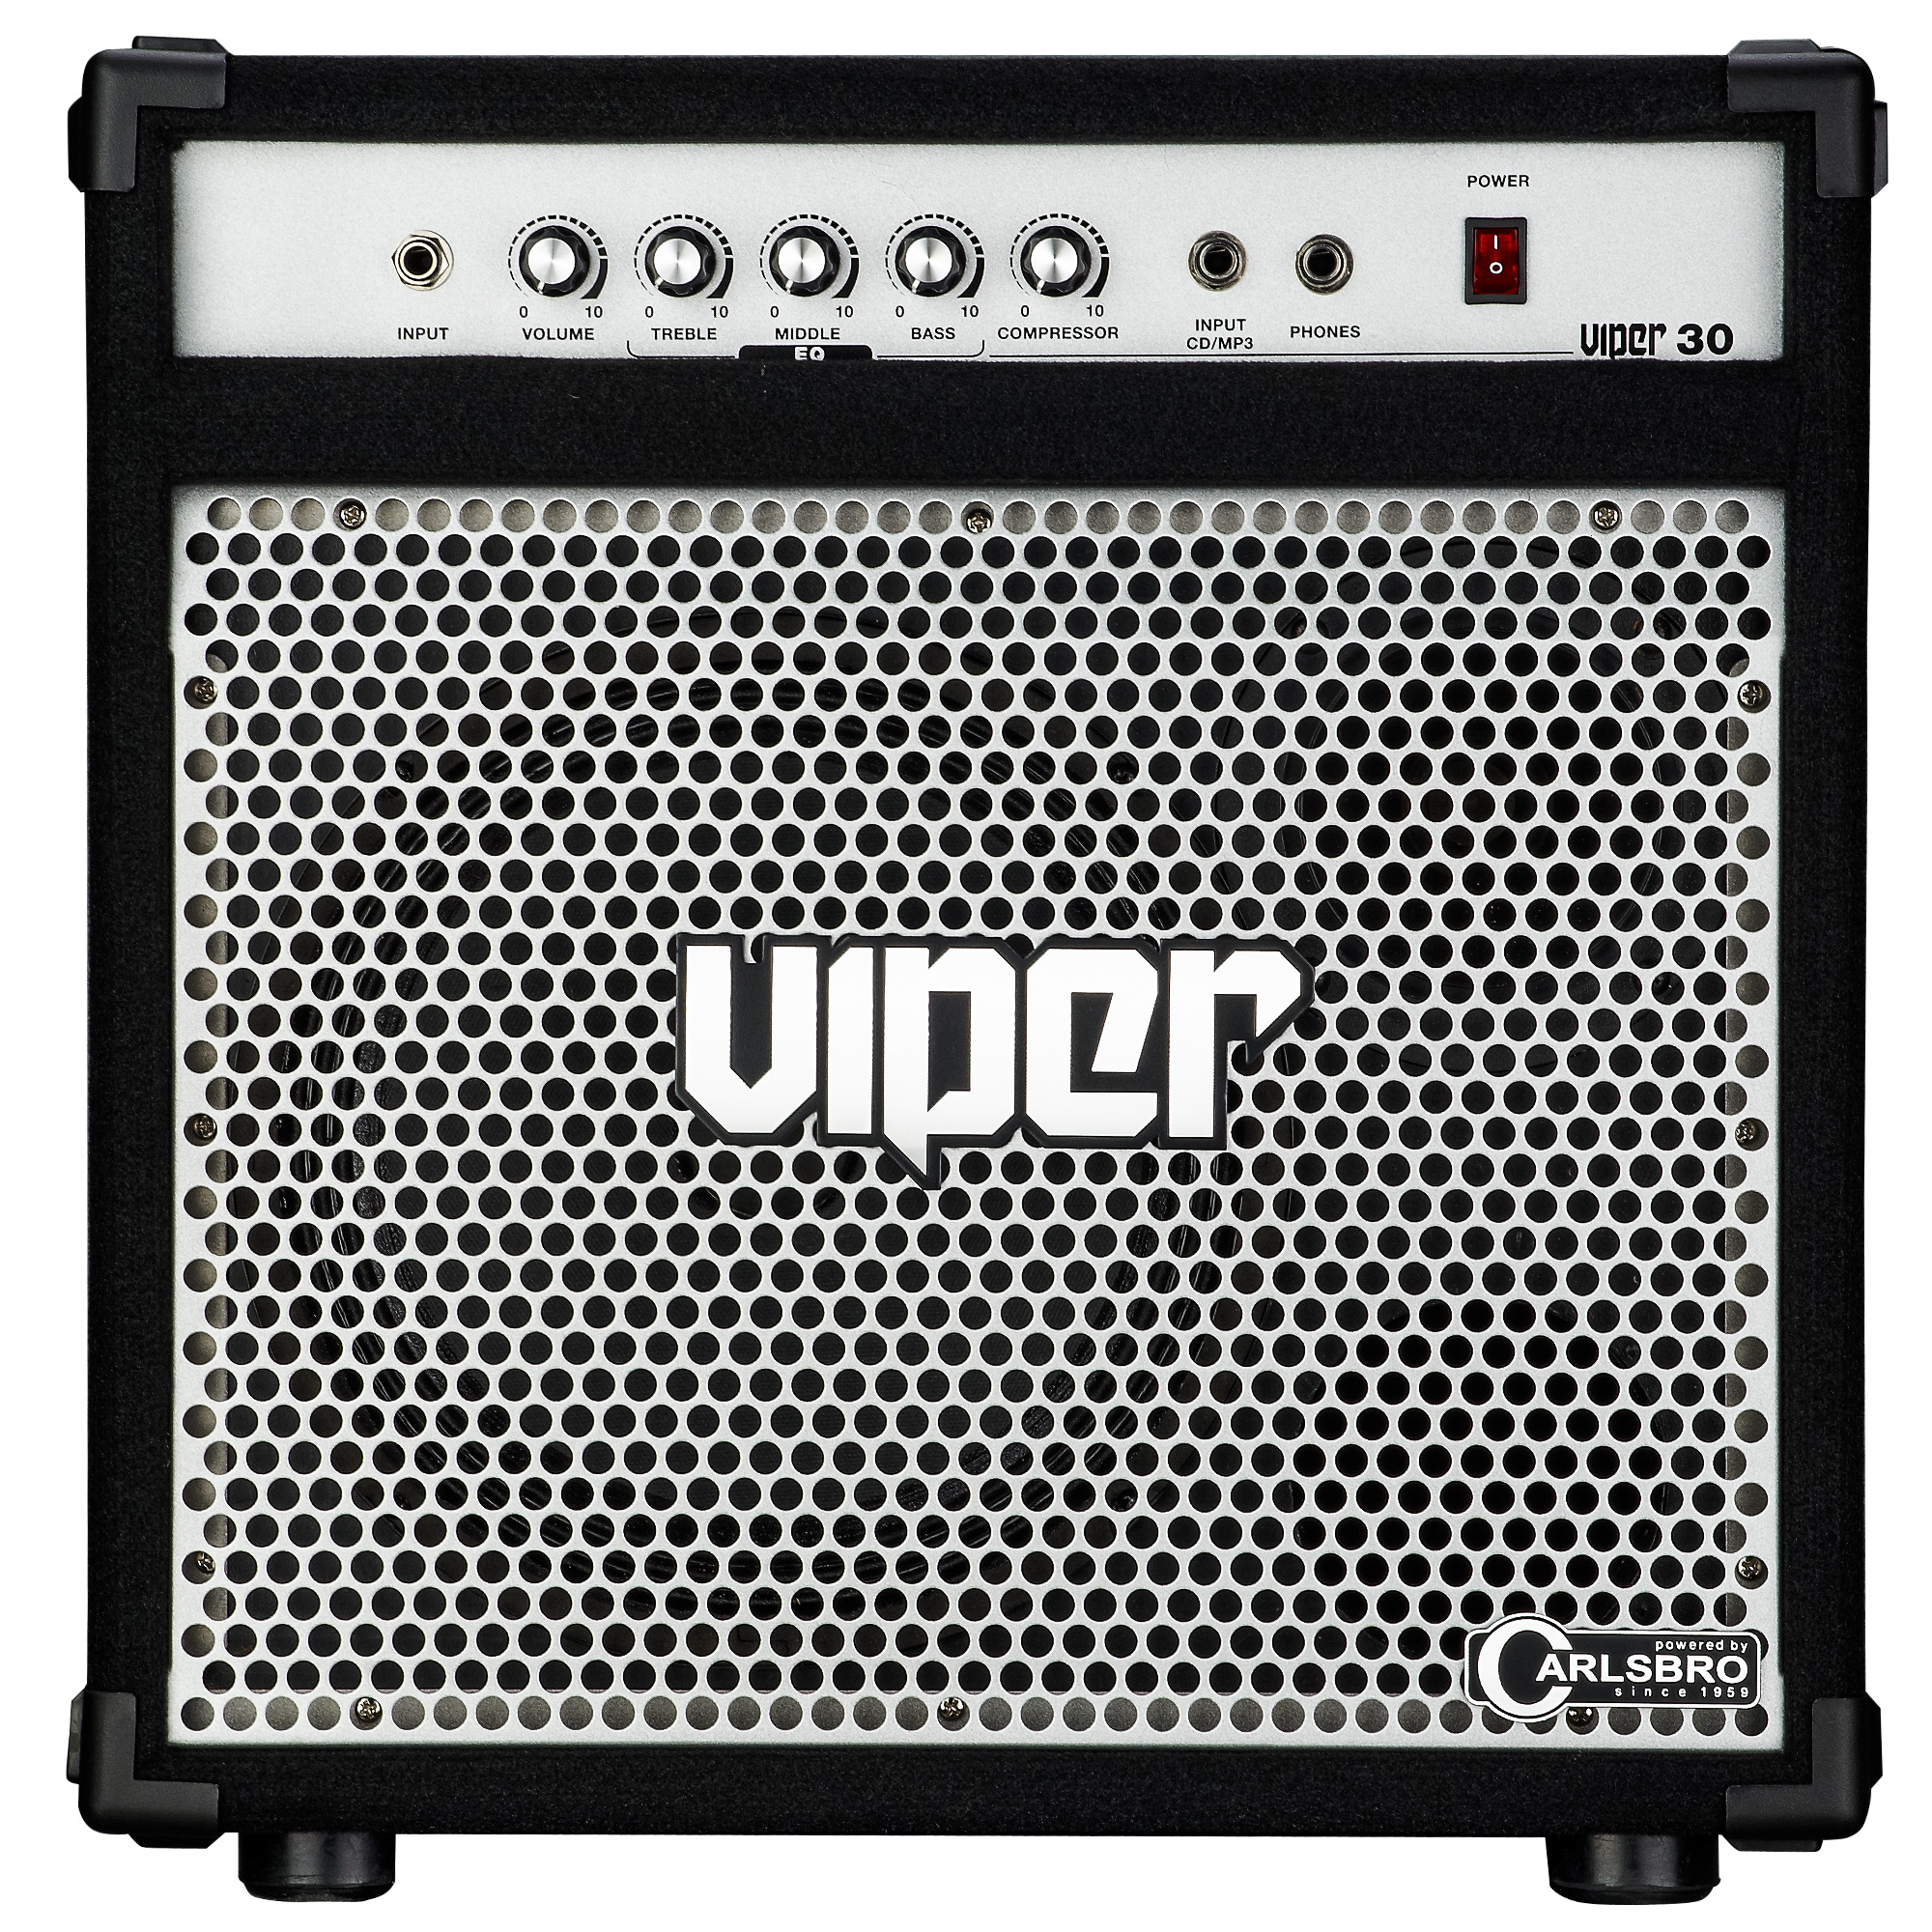 CARLSBRO VIPER30 30W Bass Amplifier Combo